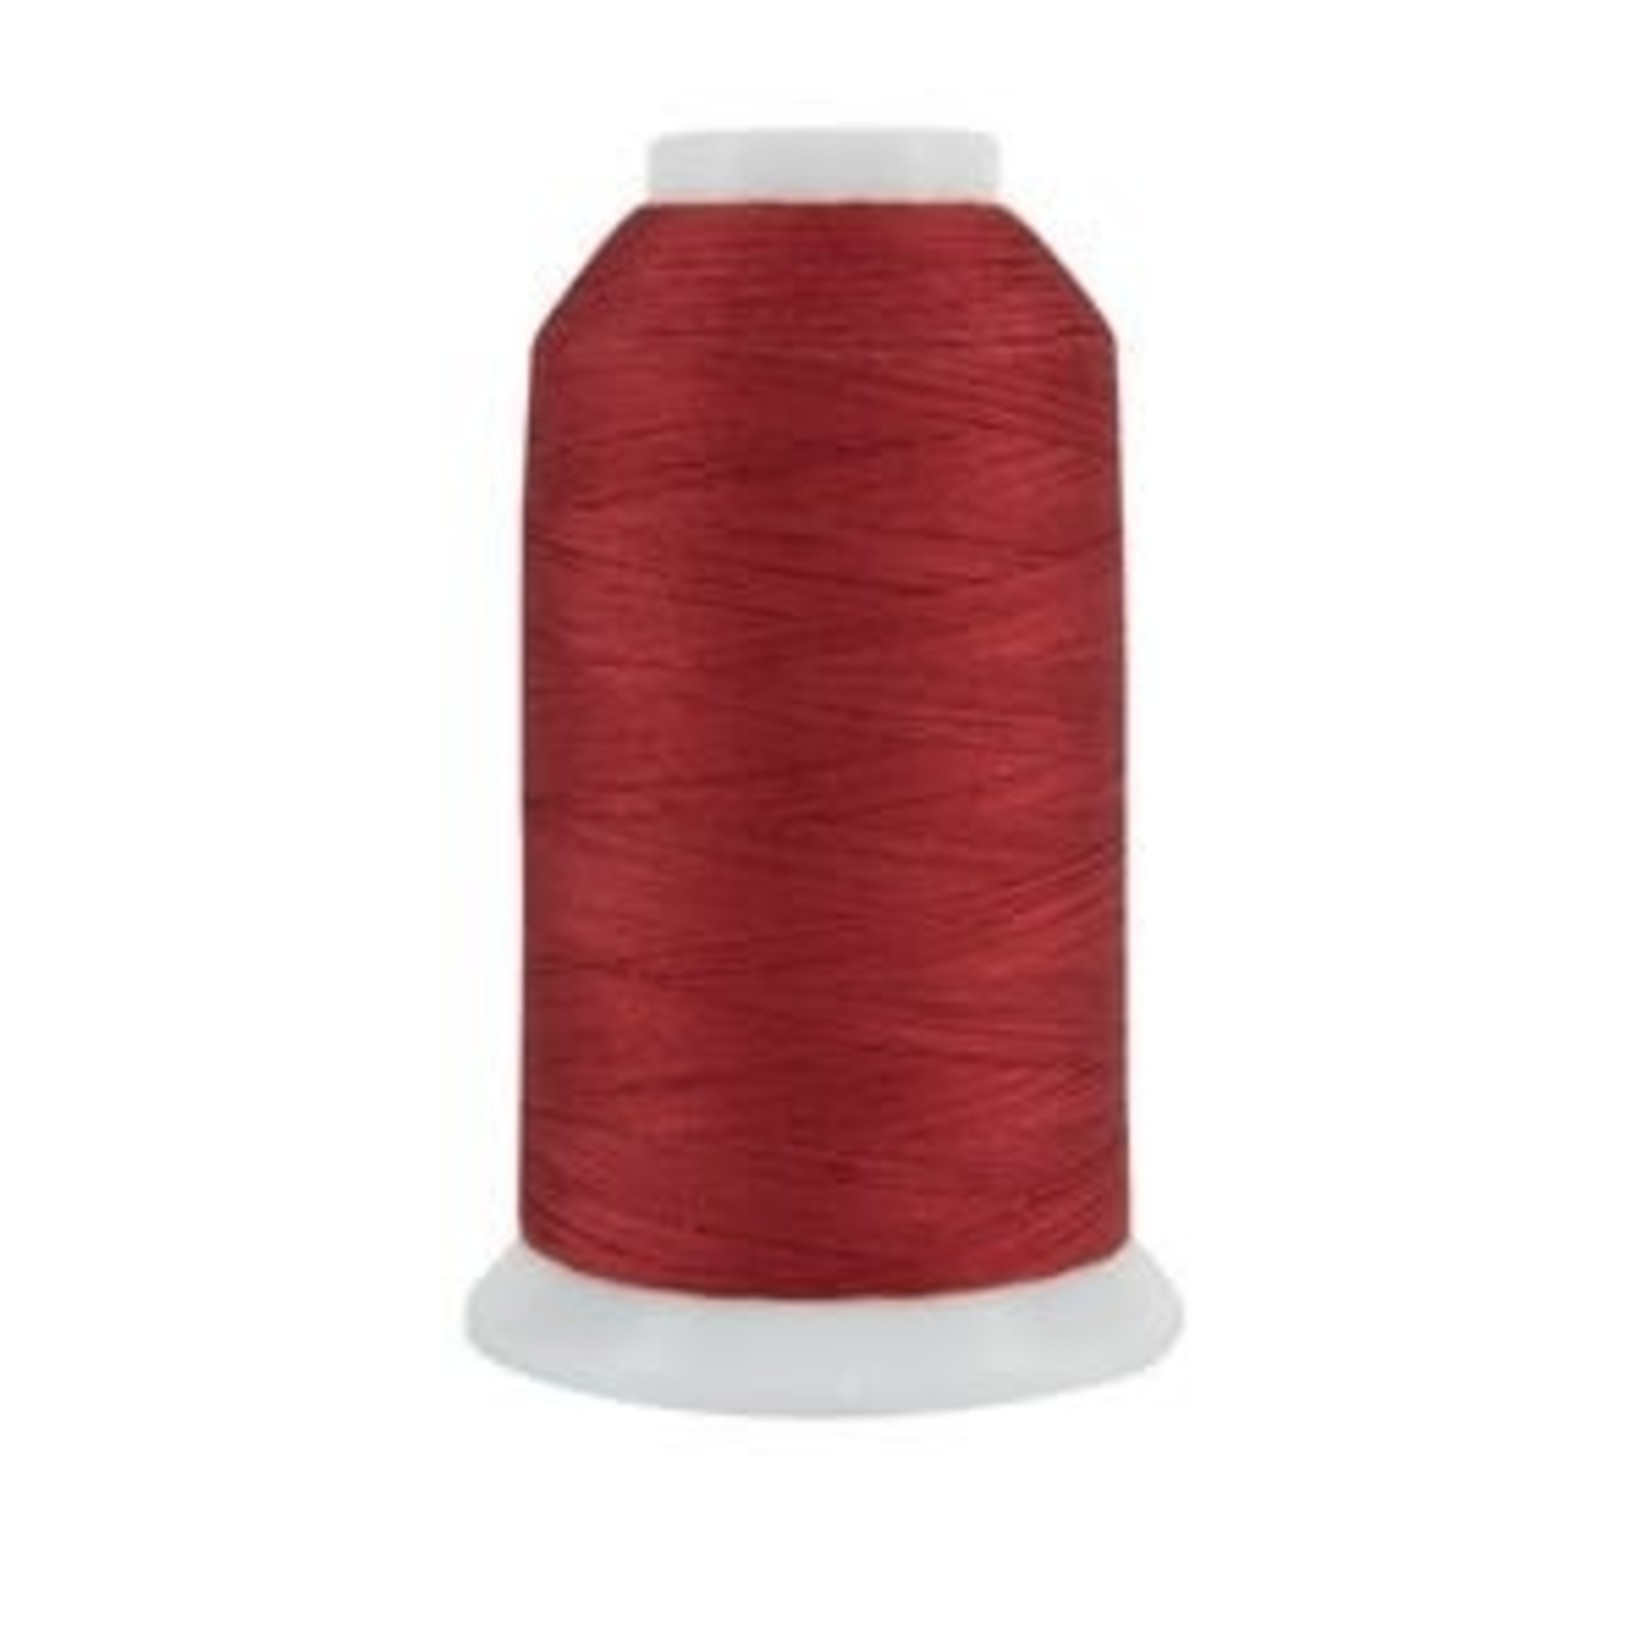 Superior Threads King Tut - #40 - 1828 m - 1021 Amish Red